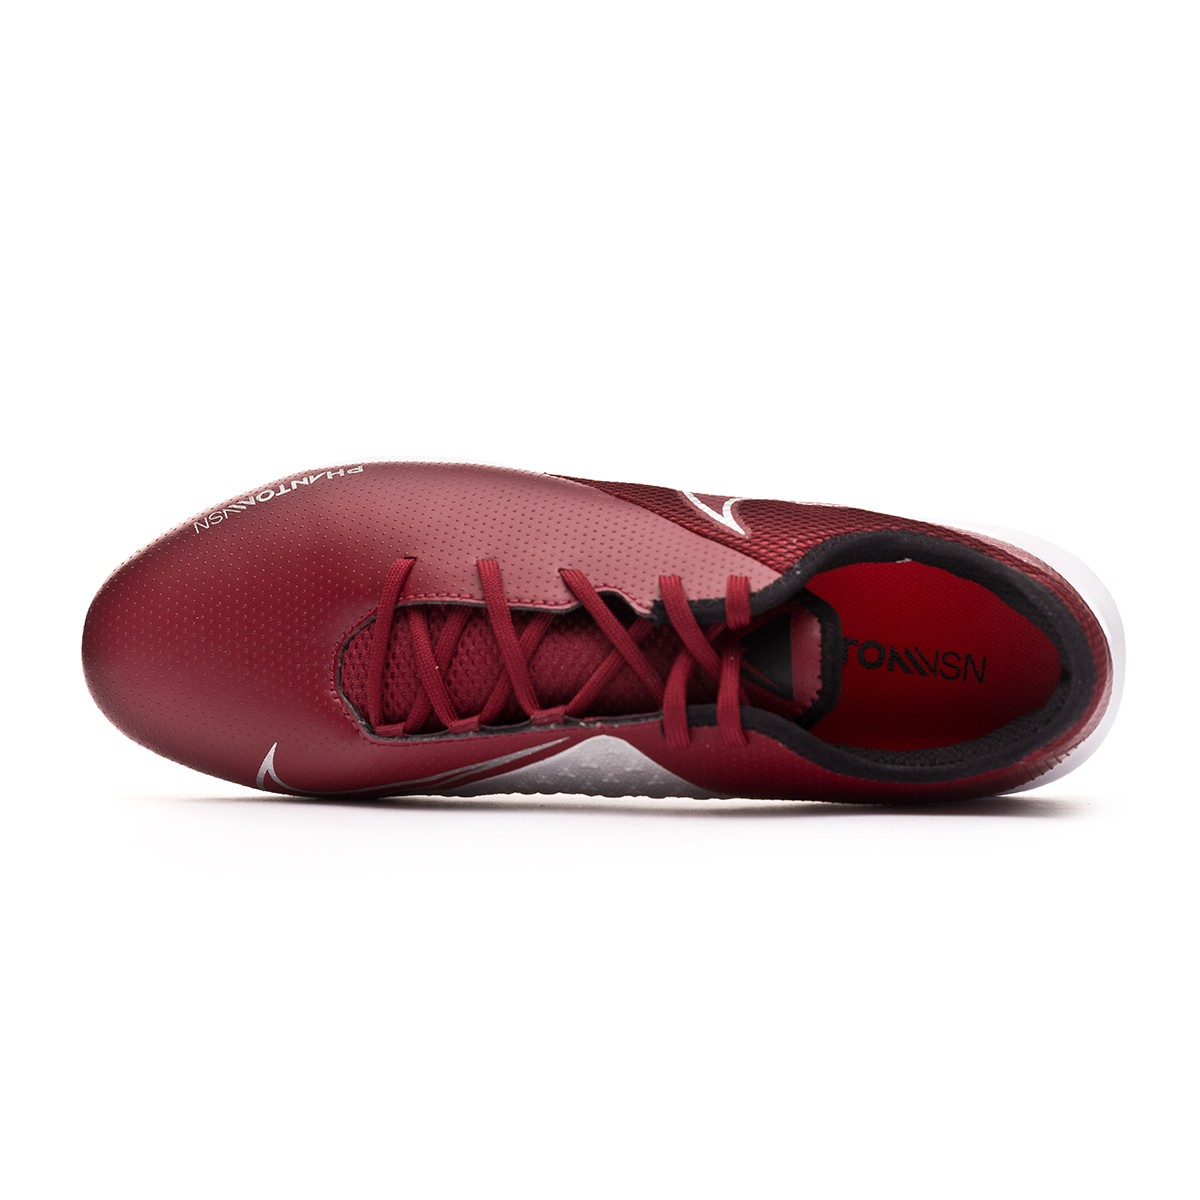 72cda0d3ca9 Futsal Boot Nike Phantom Vision Academy IC Team red-Metallic dark grey- Metallic silver - Football store Fútbol Emotion